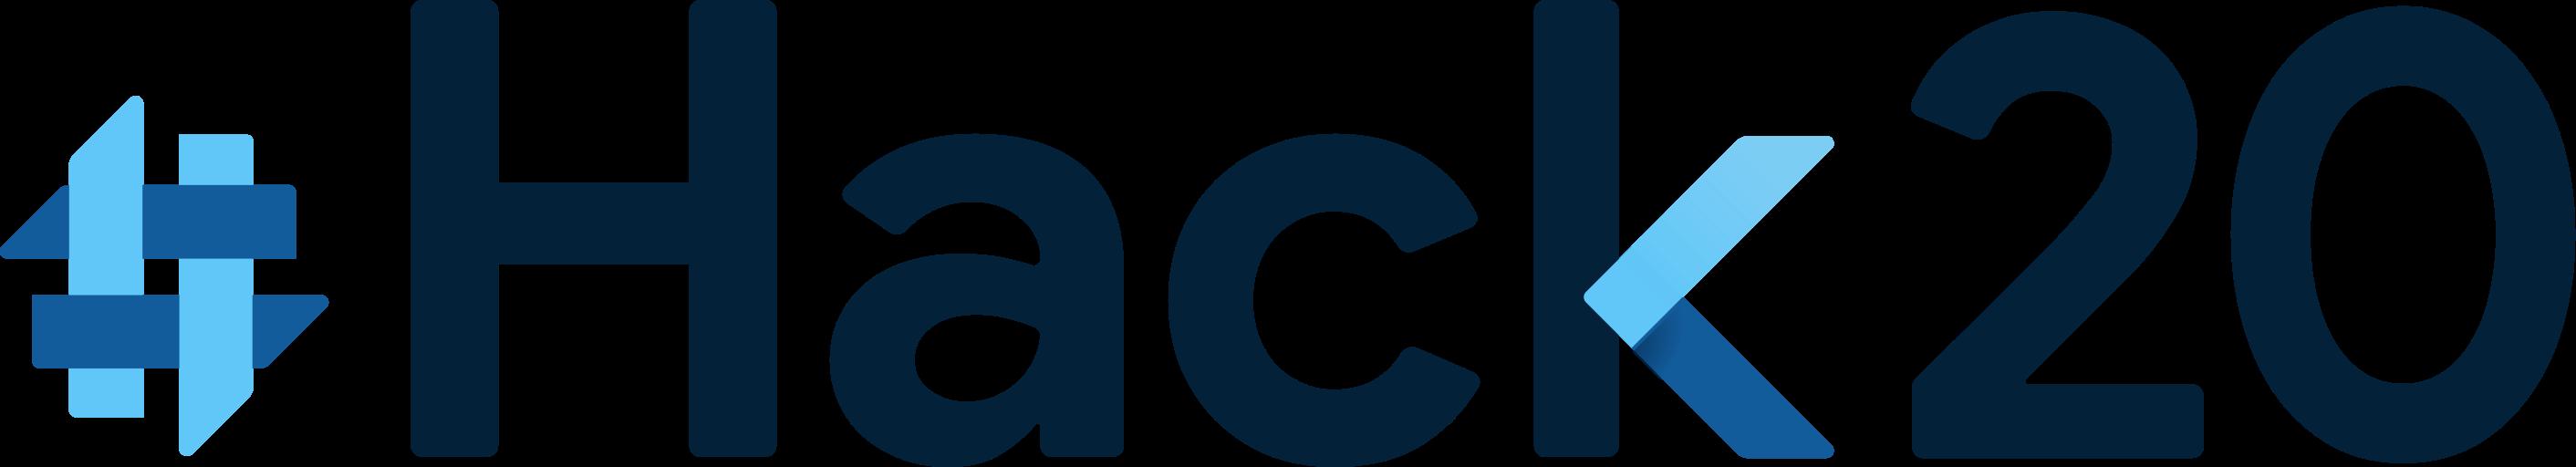 Hack20 Logo